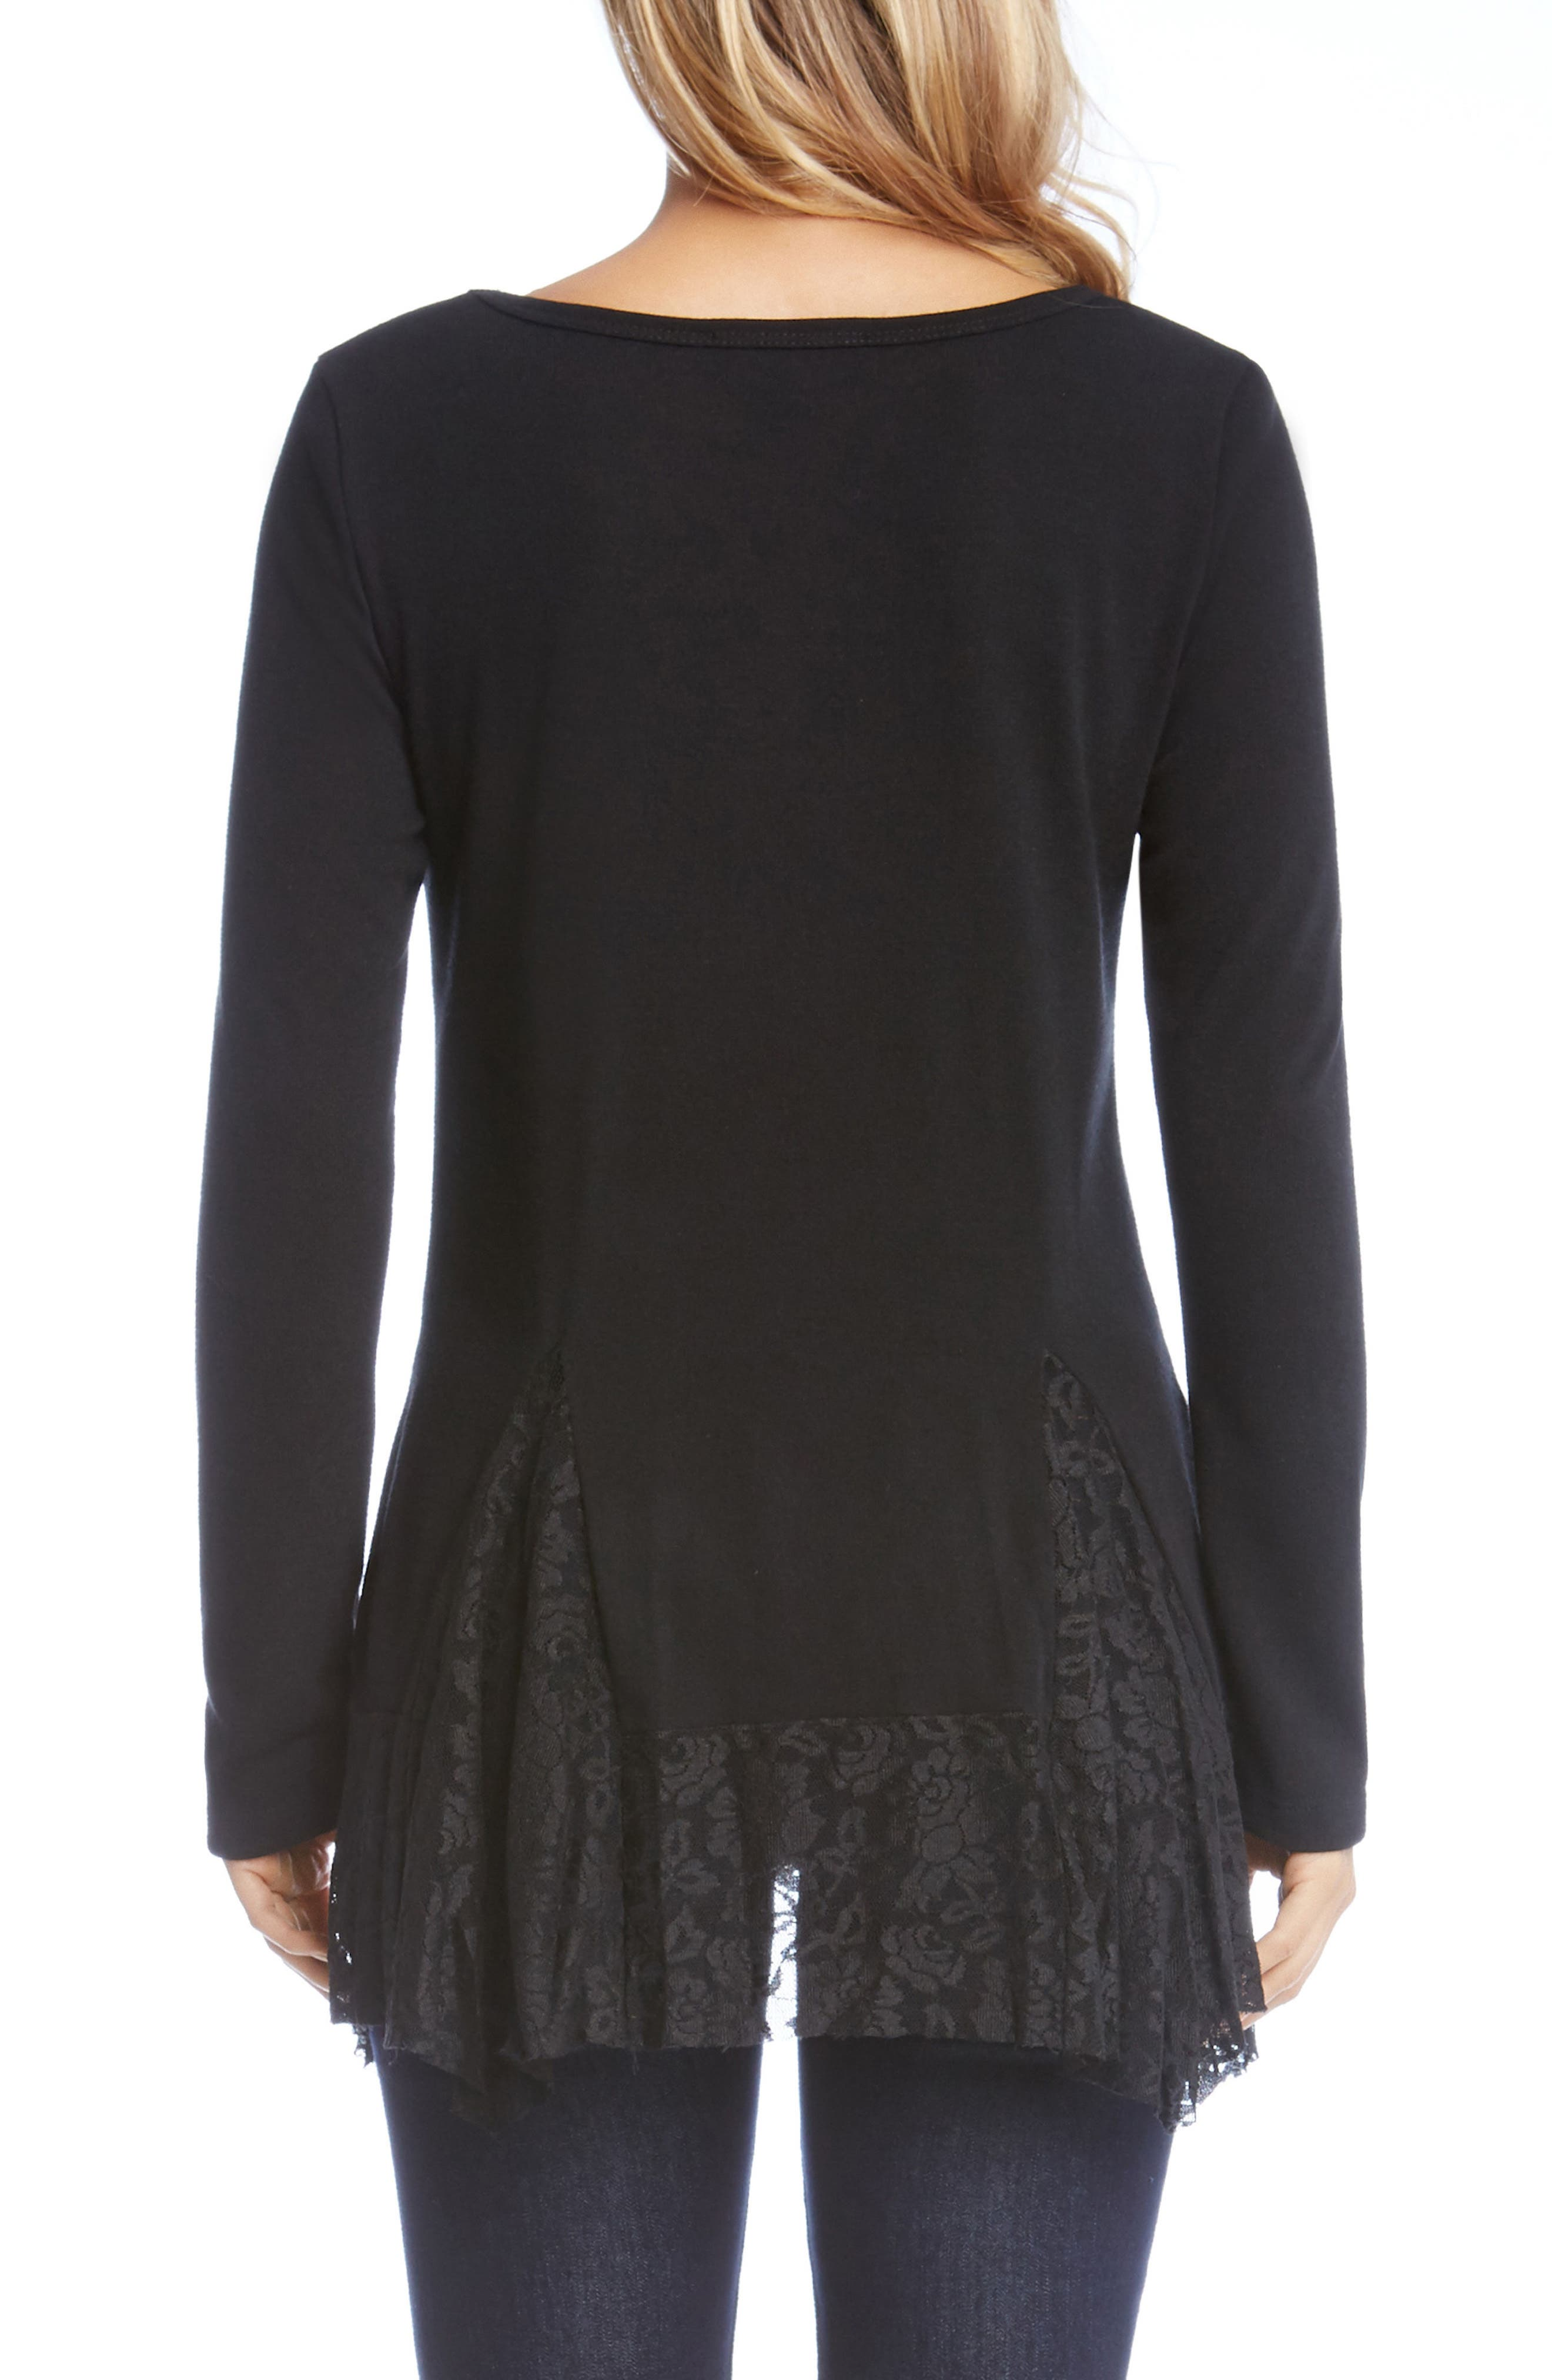 Karen Karen Lace Inset Sweater,                             Alternate thumbnail 2, color,                             Black